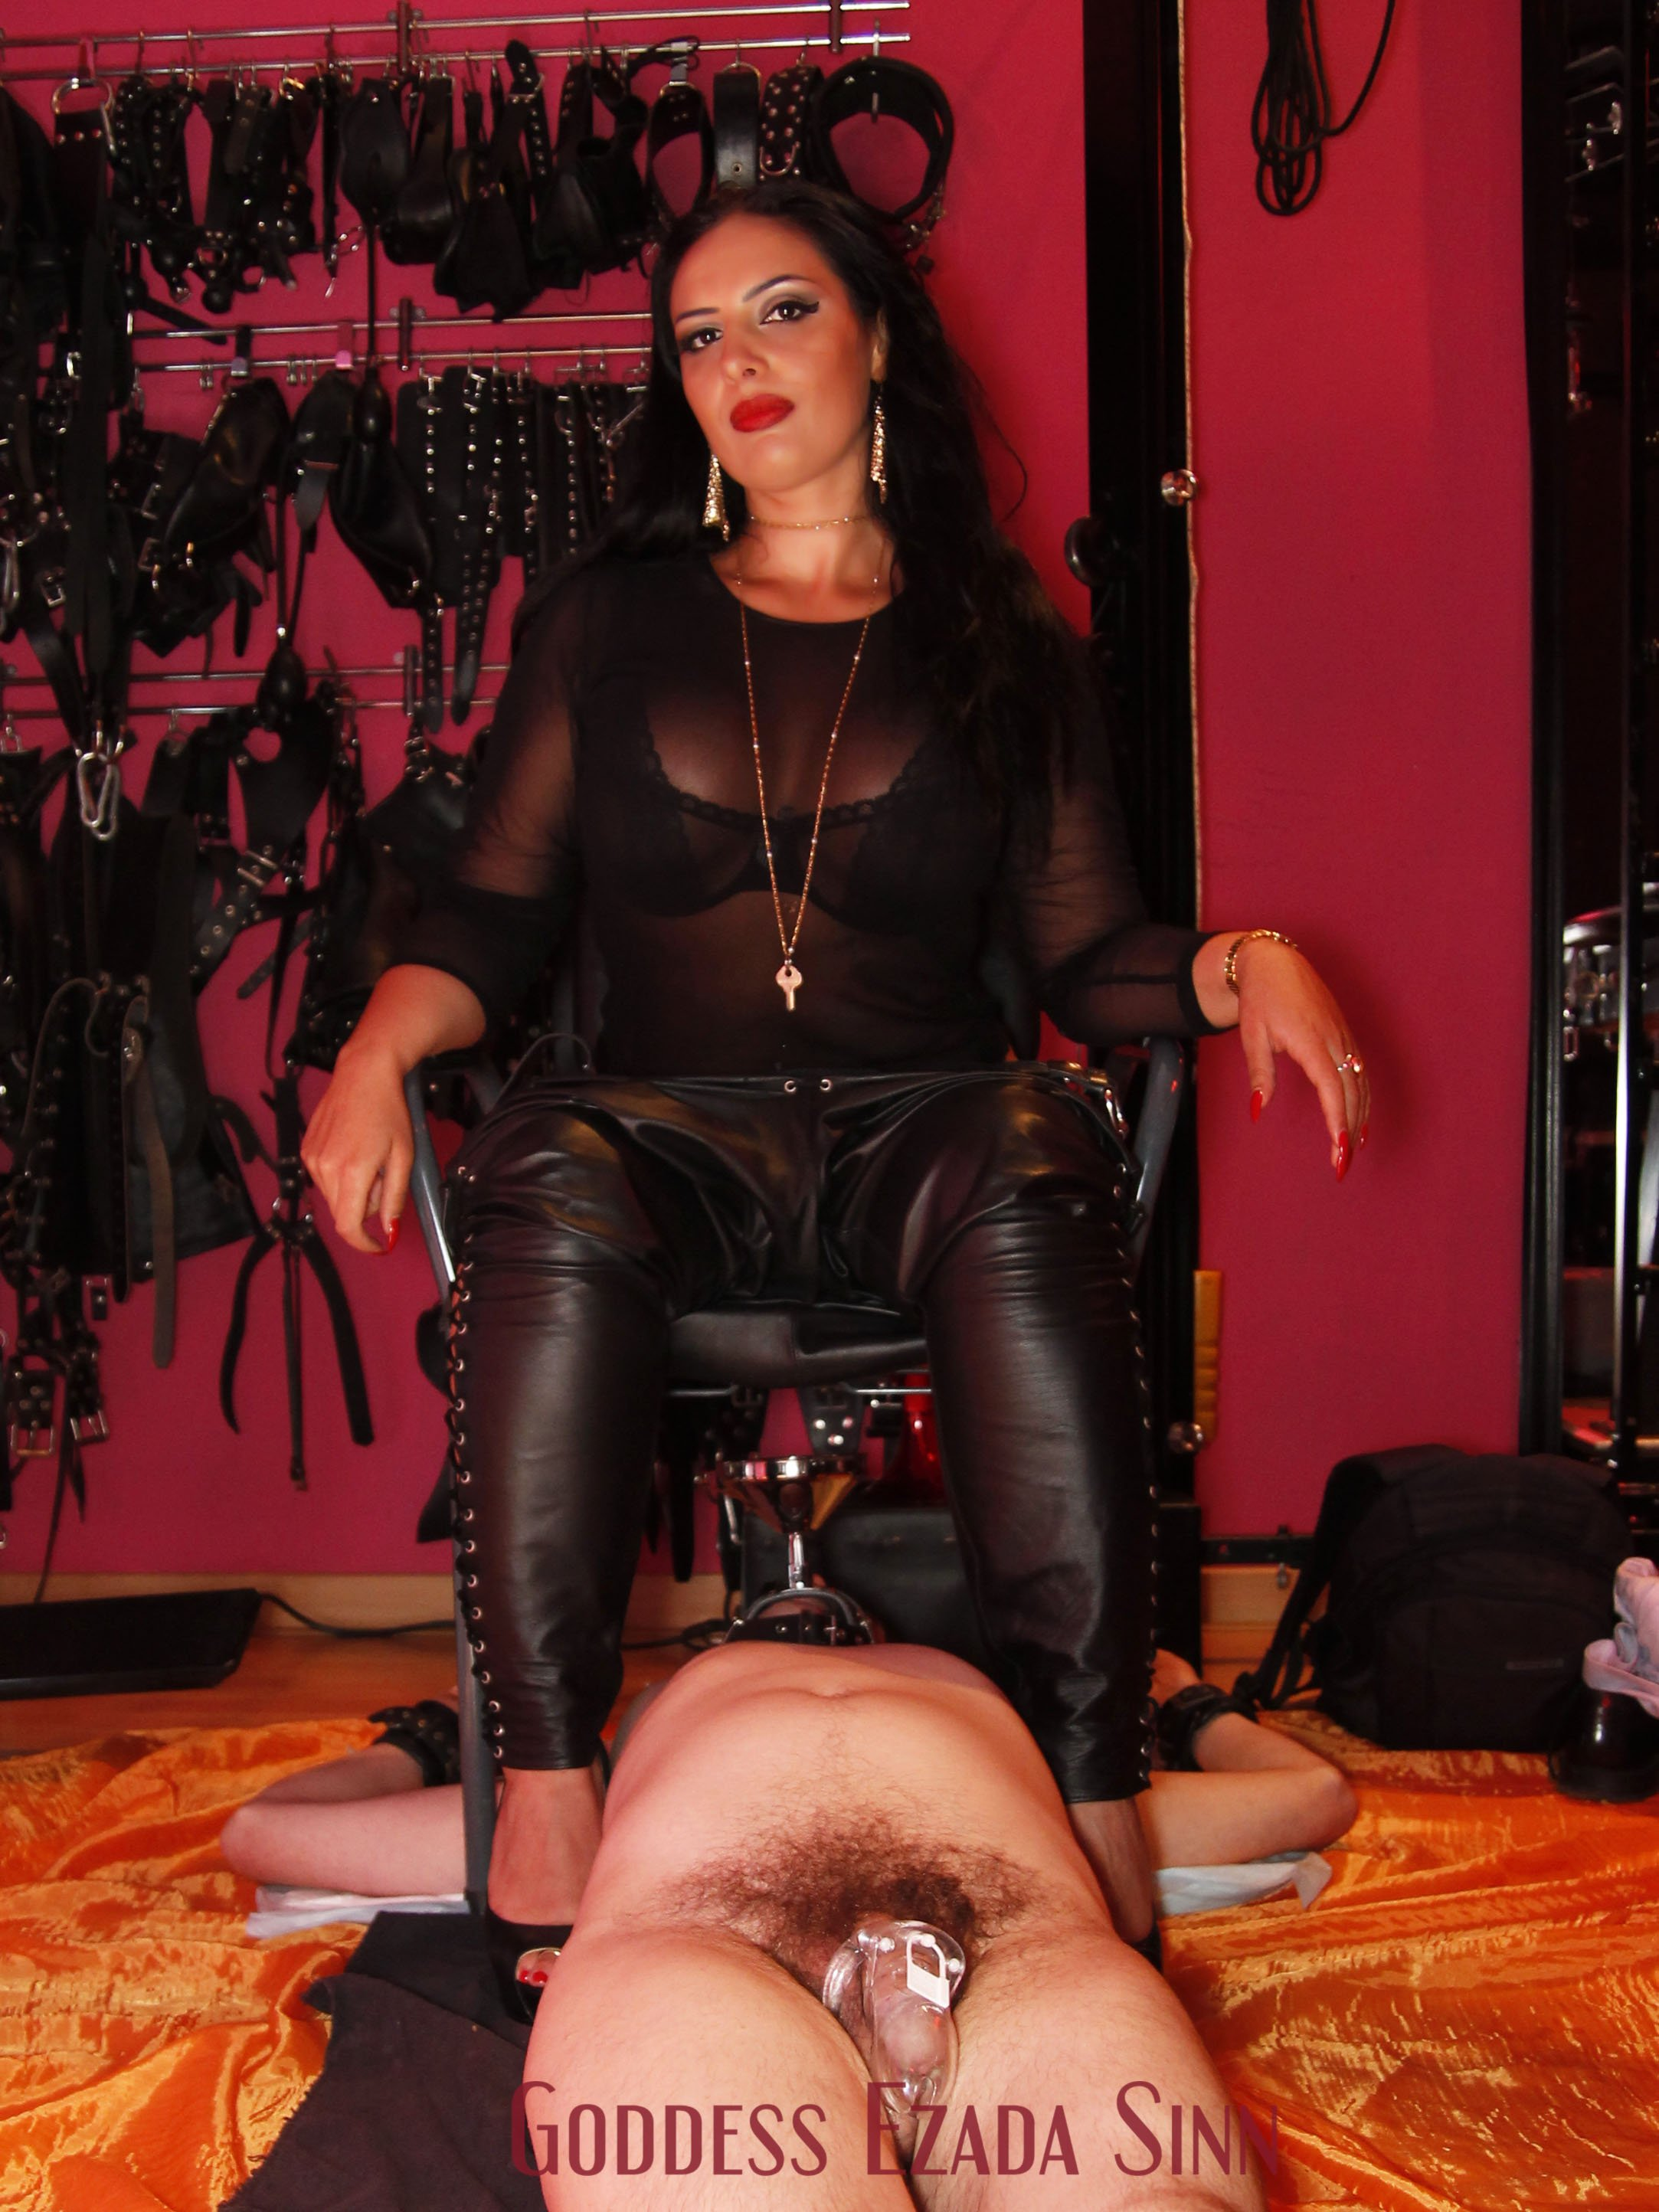 Wife orgy you tube amatuer